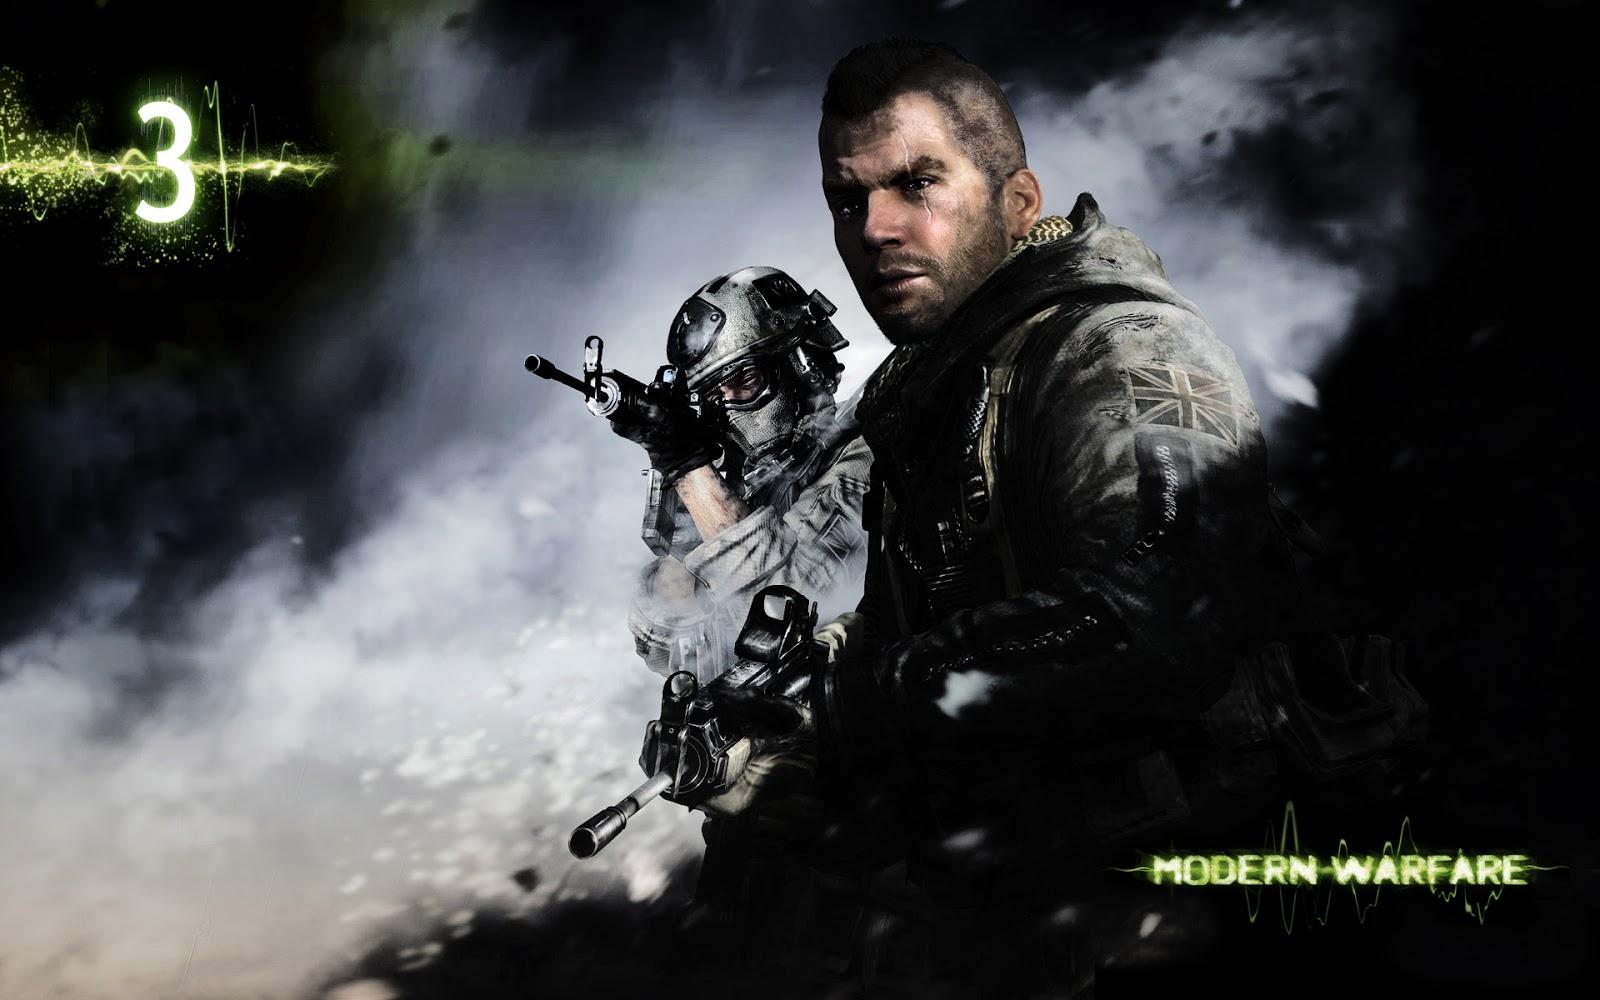 HD WALLPAPERS: Call of Duty Modern Warfare 3 HD Wallpapers